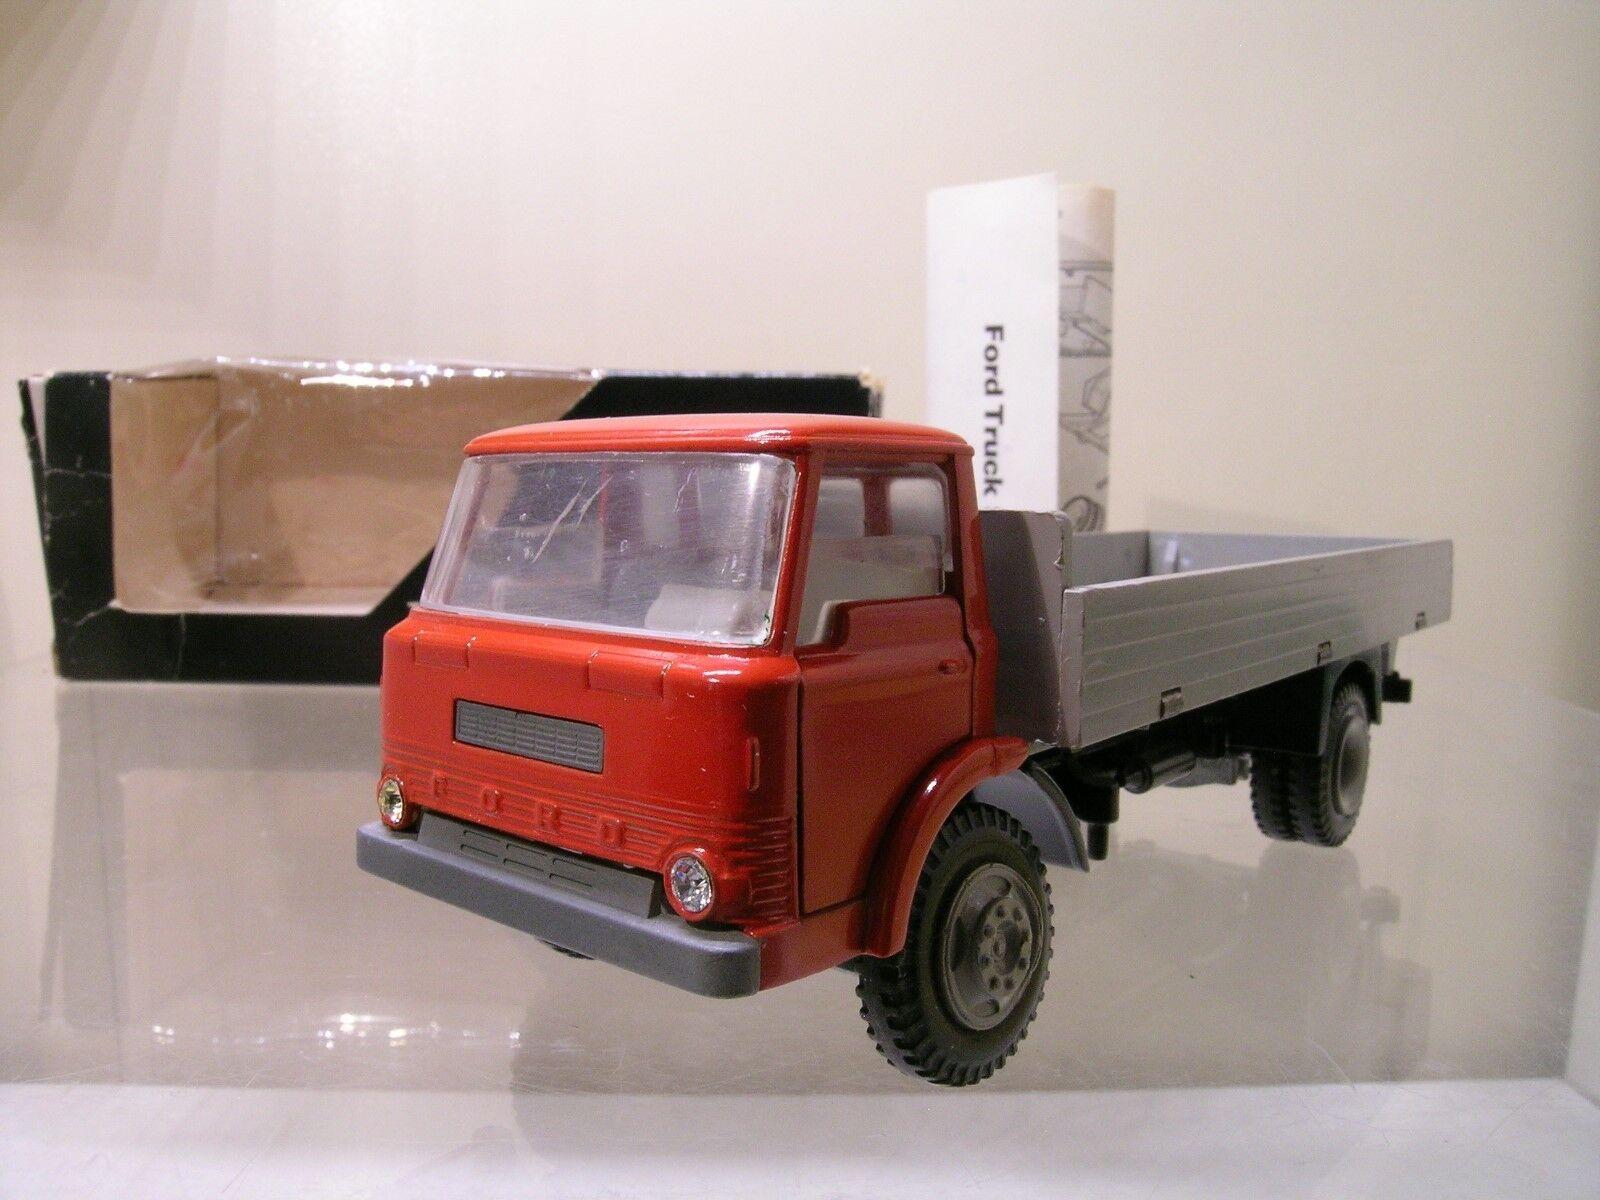 KIRK NO TEKNO DENMARK No.915 FORD D800 TRUCK rojo gris + BOX 1 50